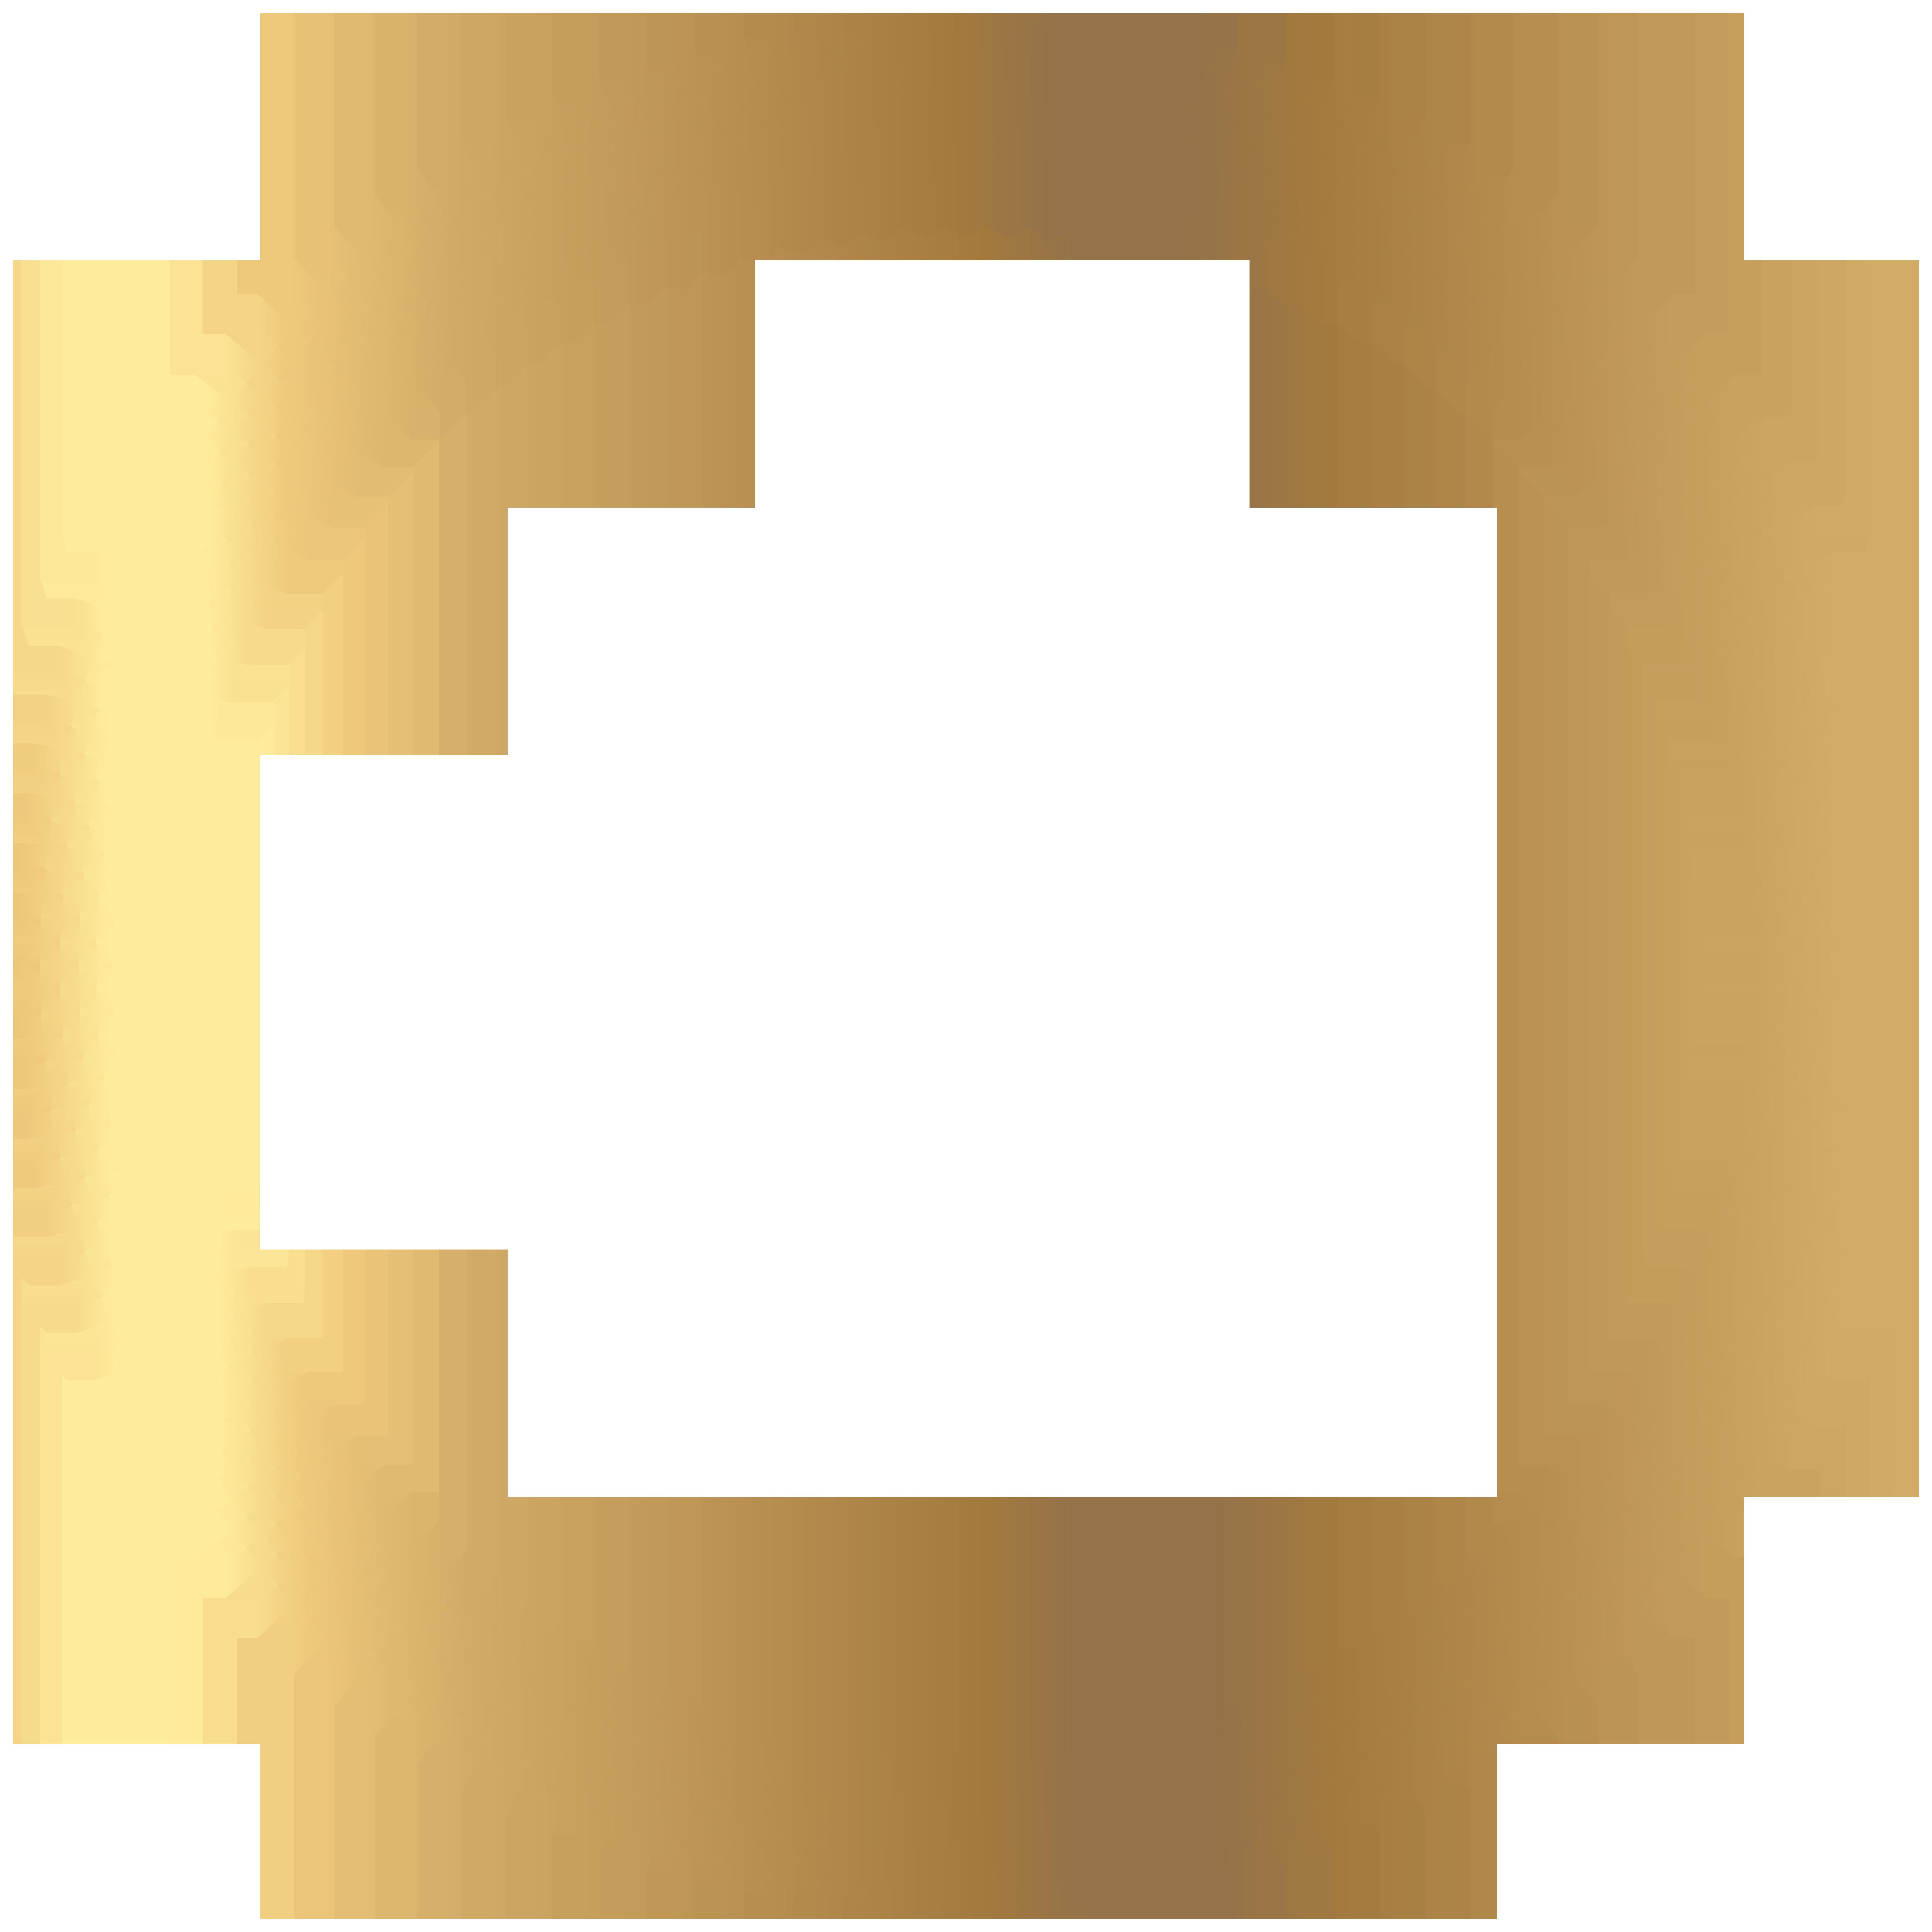 Deco gold round transparent. Circle border png